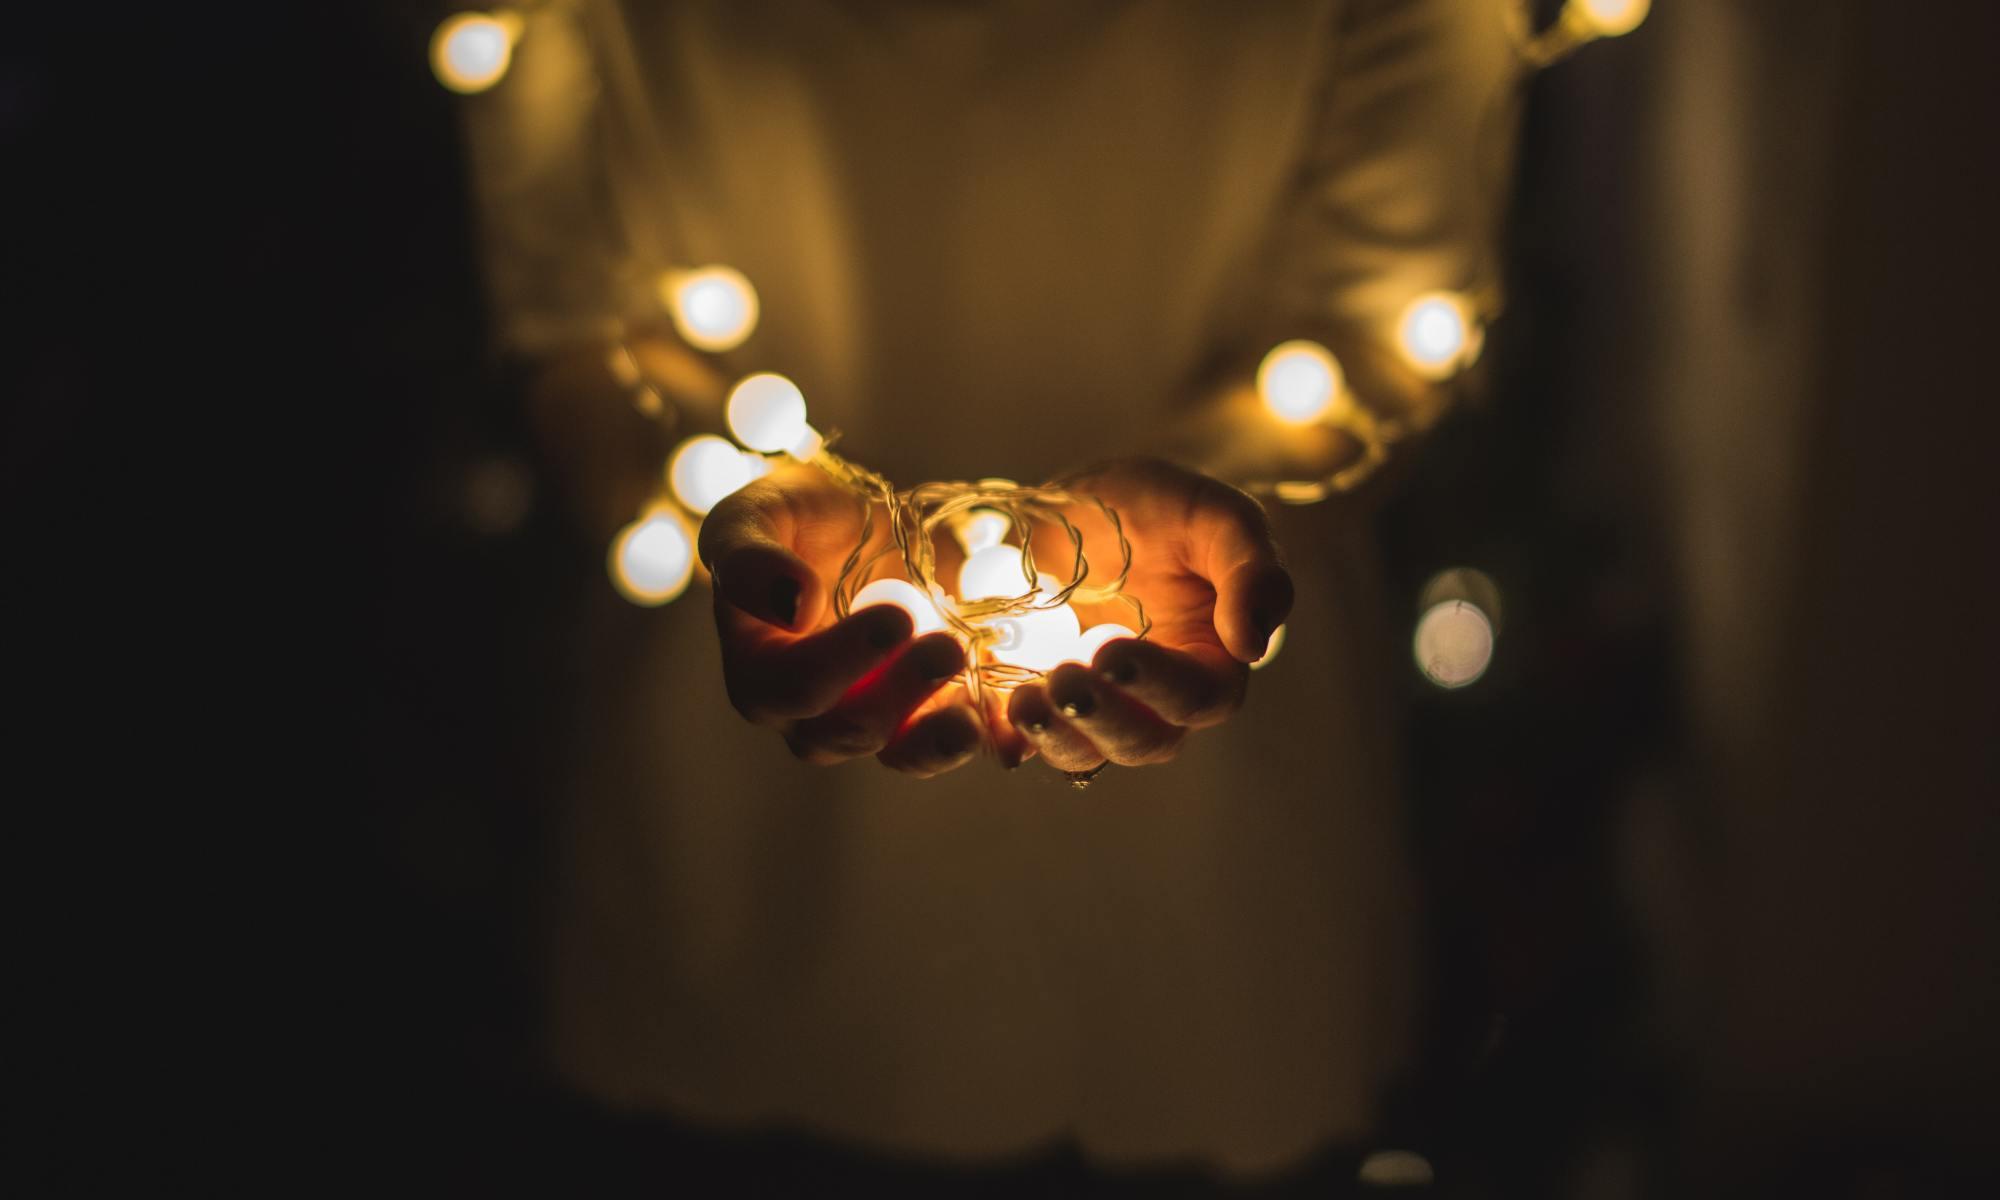 Holding fairy lights